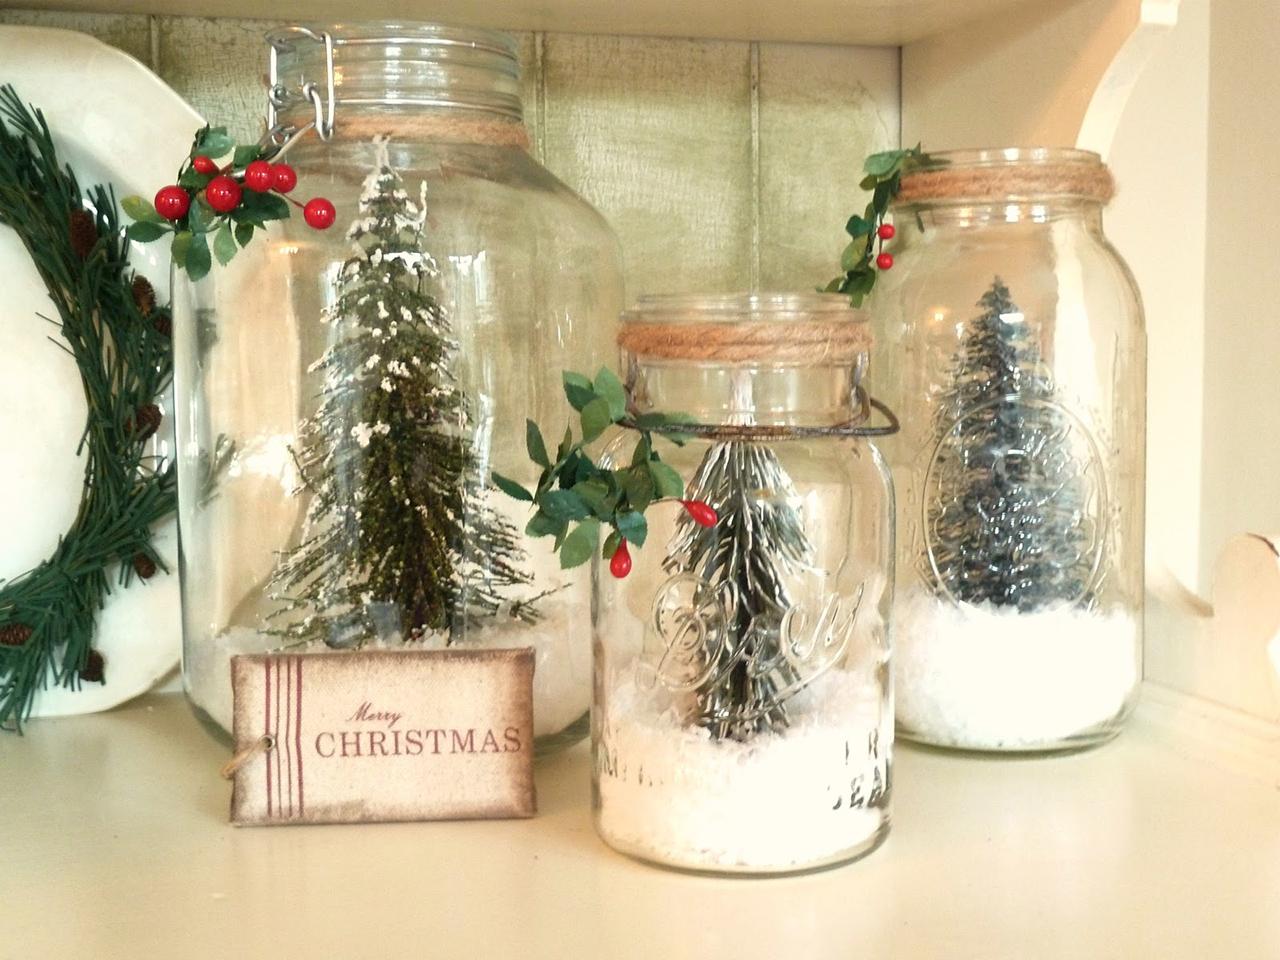 Christmas decoration ideas diy christmas snow globes EOQRZWX